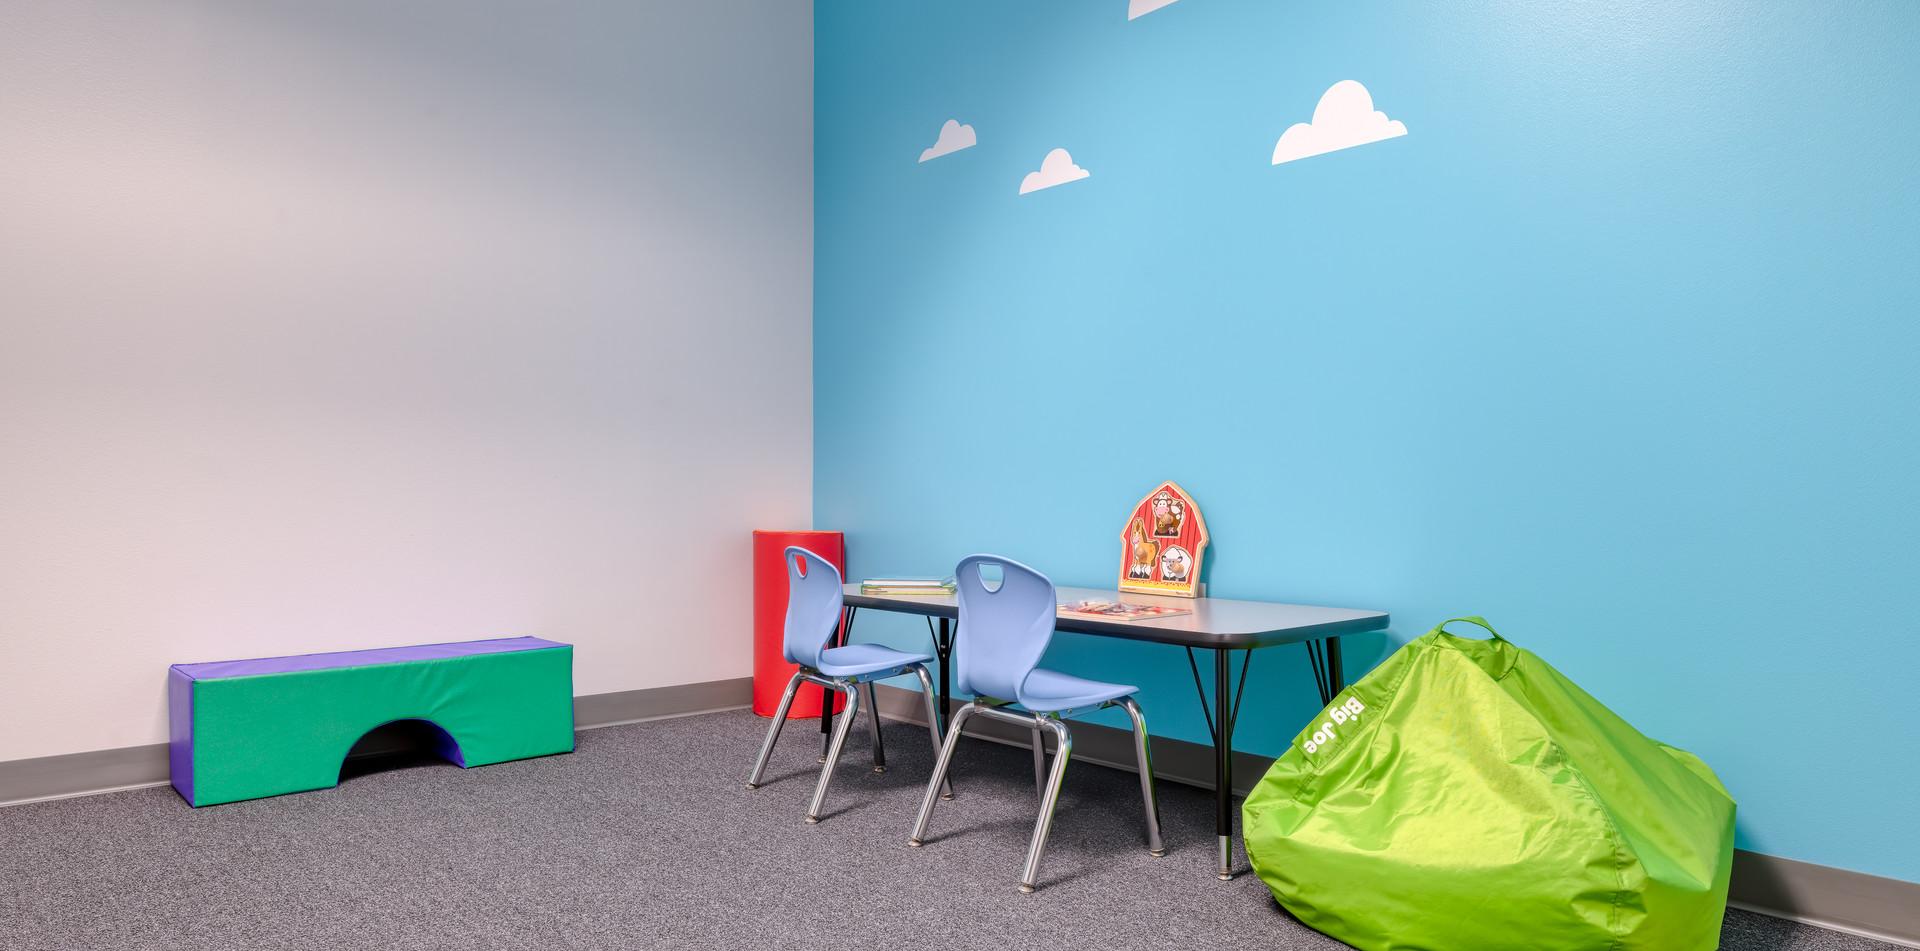 Houston Center Treatment Room 2